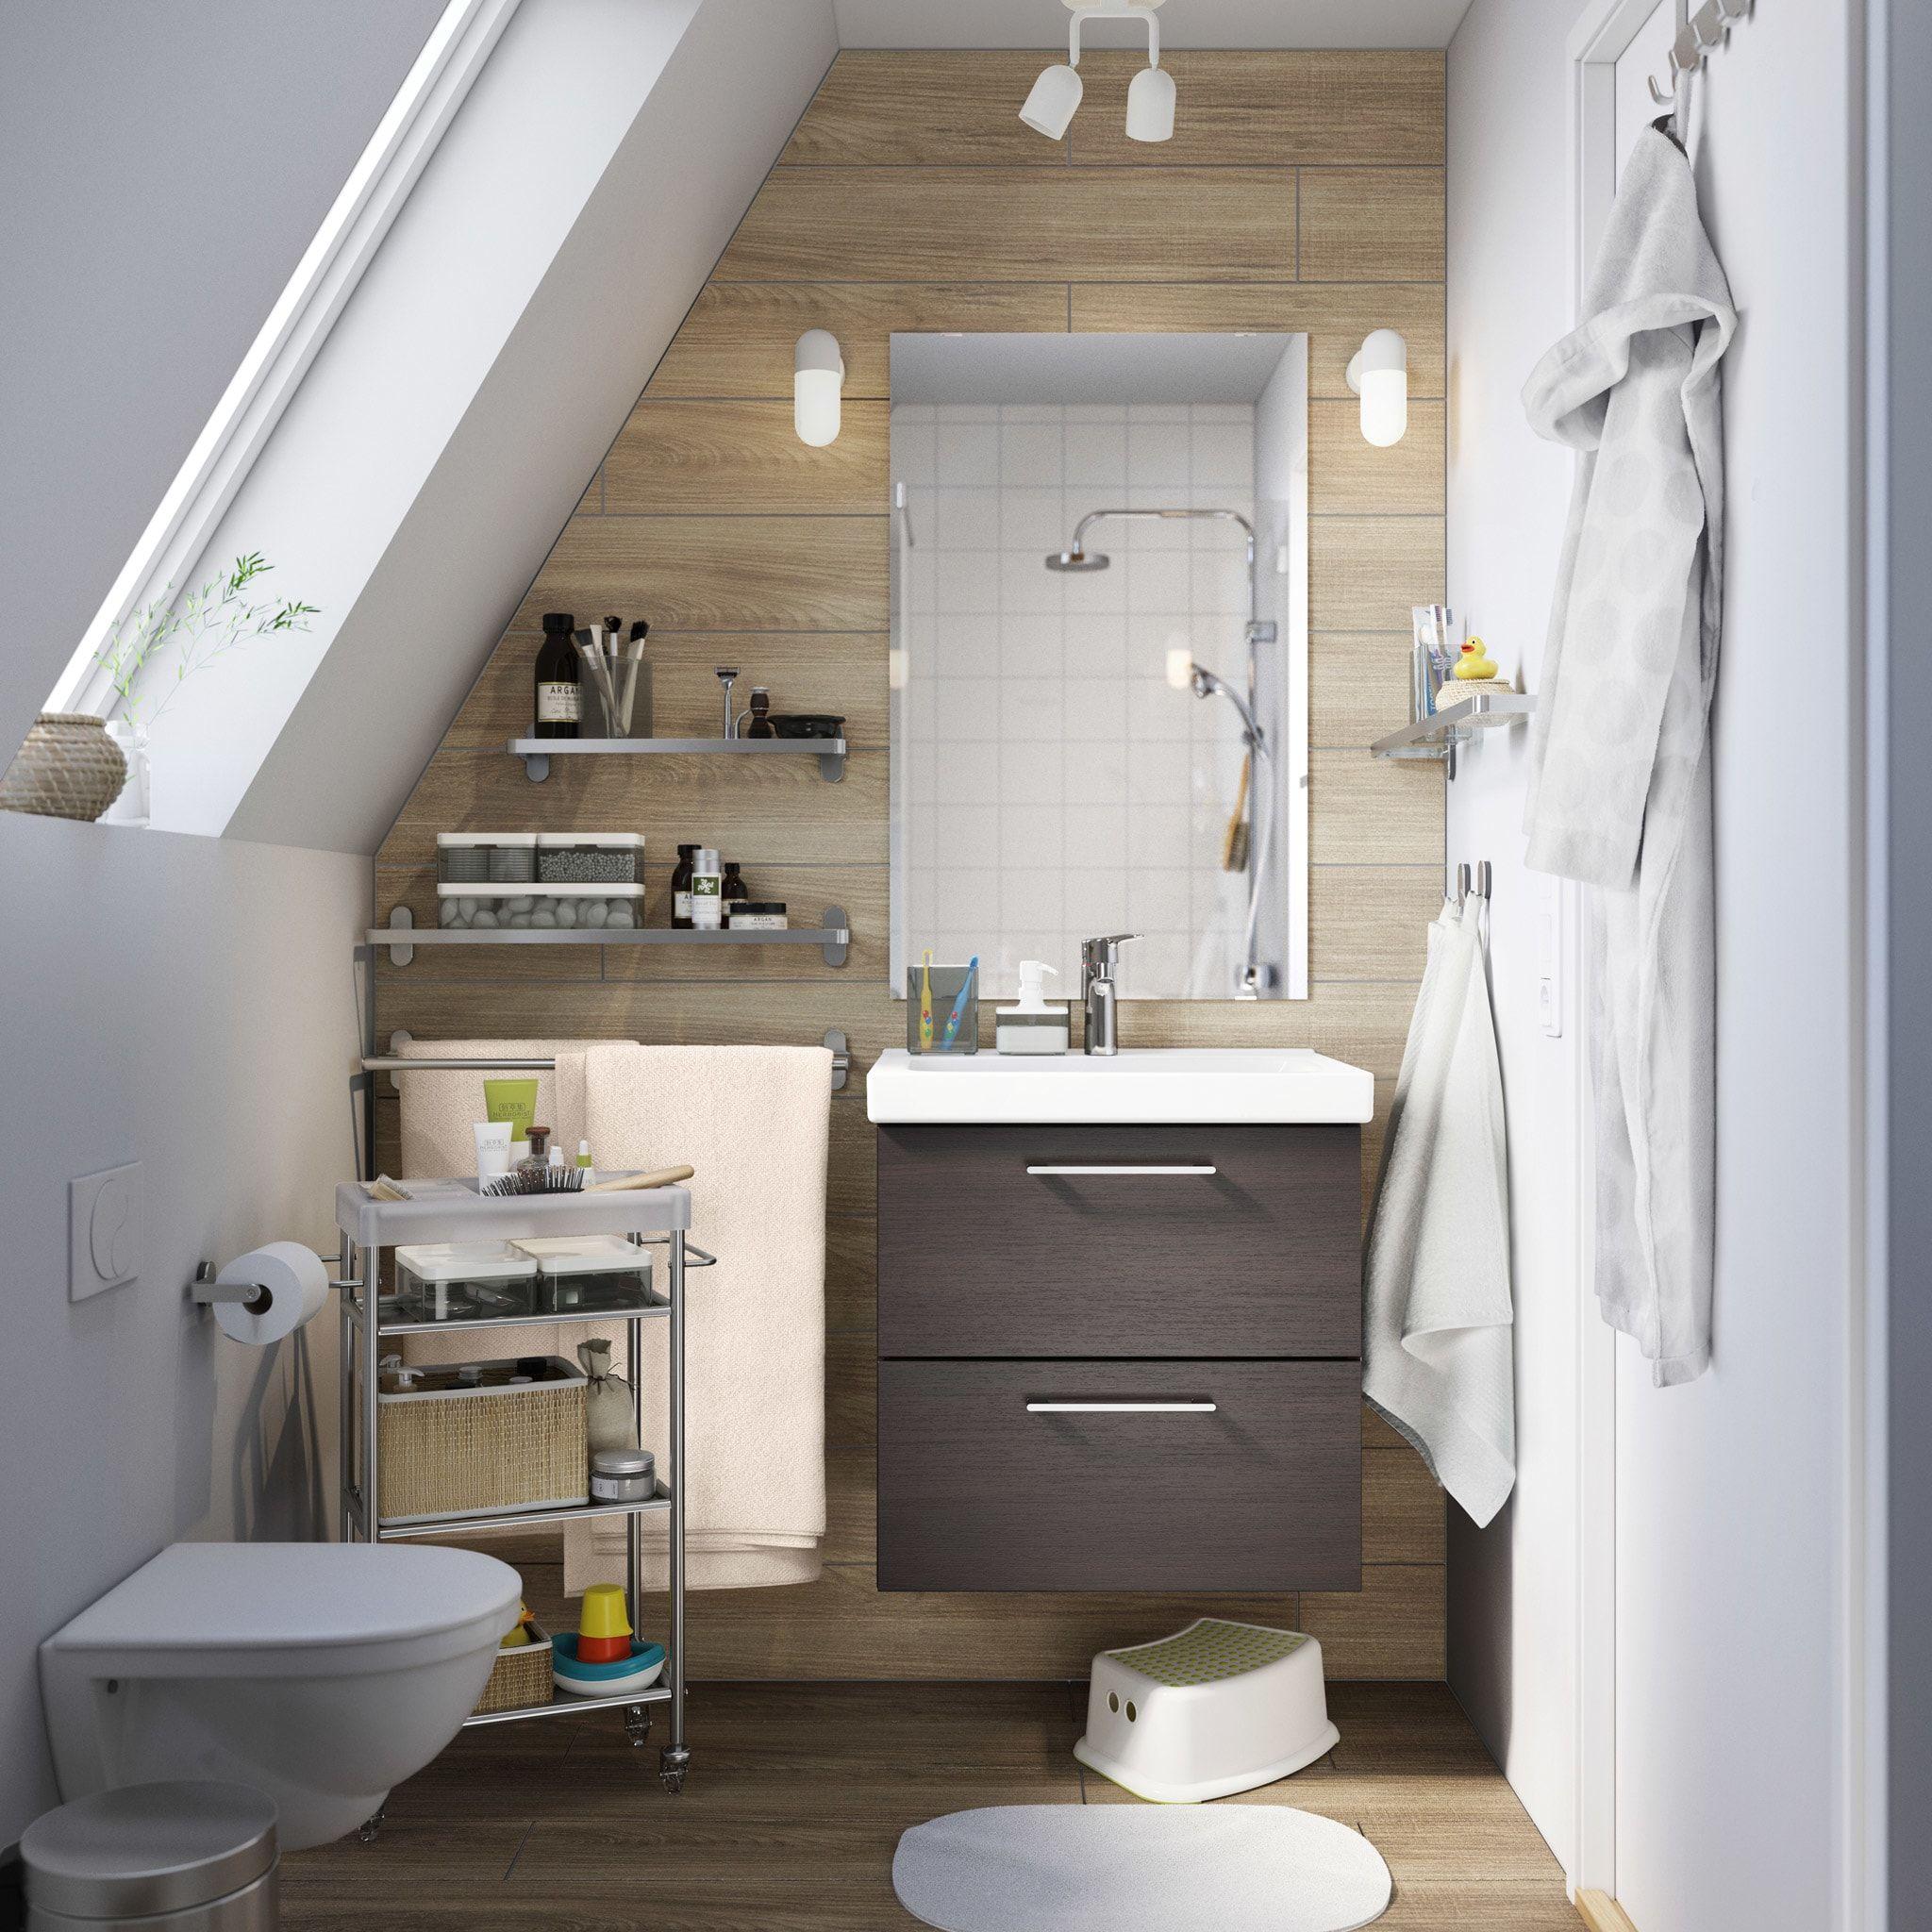 Modern Bathrooms Design Ideas From Ikea   Bathroom ...